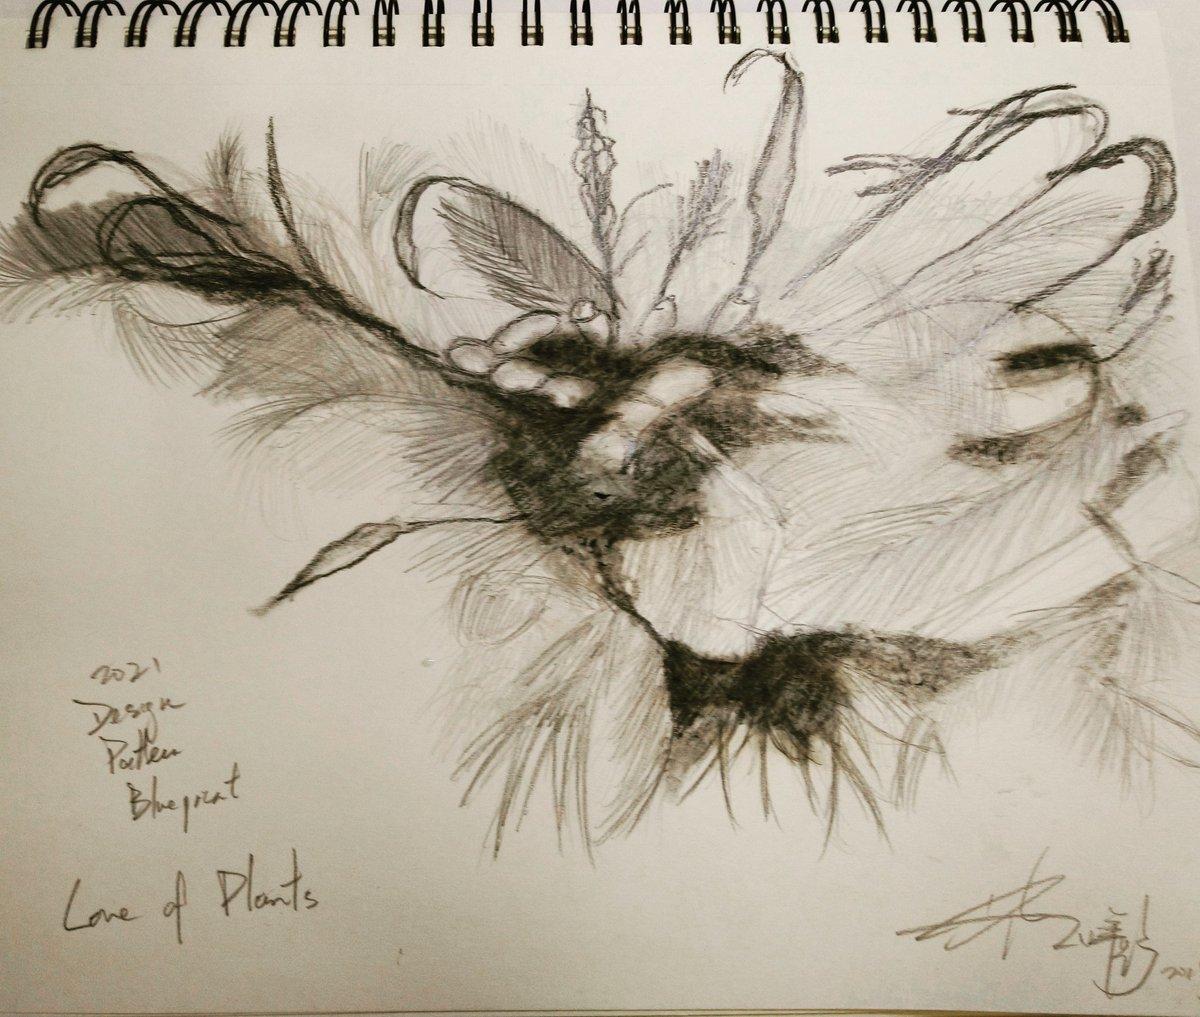 Love Name Sketch Art